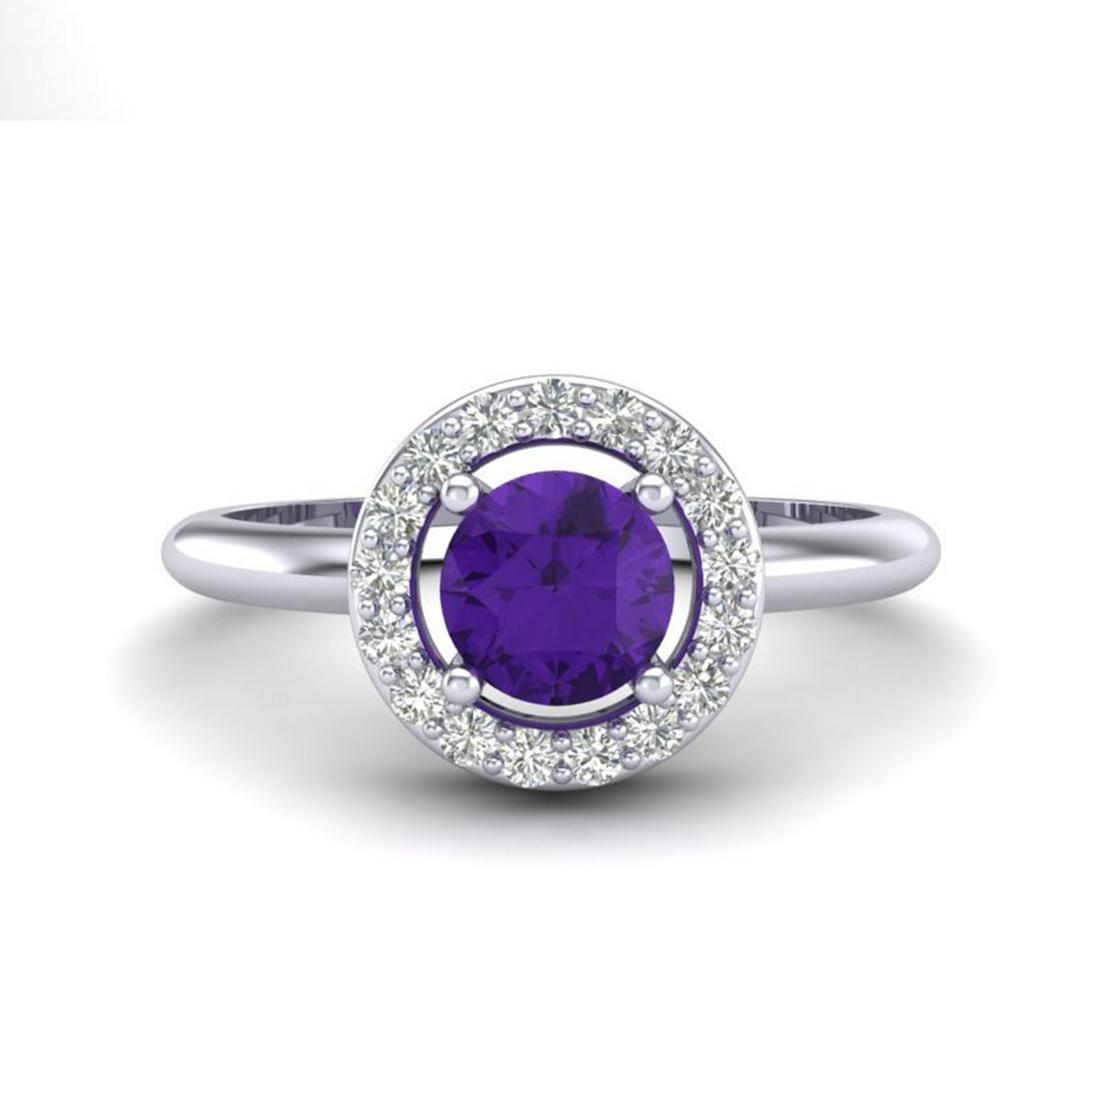 0.75 ctw Amethyst & VS/SI Diamond Ring 18K White Gold -